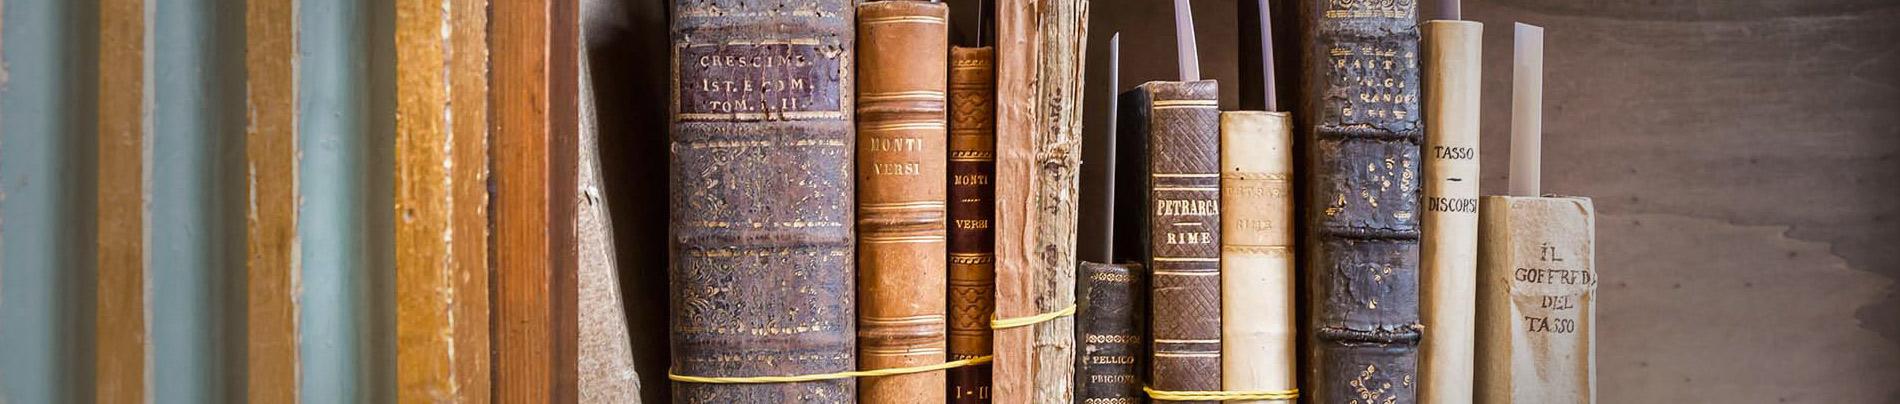 gonnelli-libri-antichi-overlay